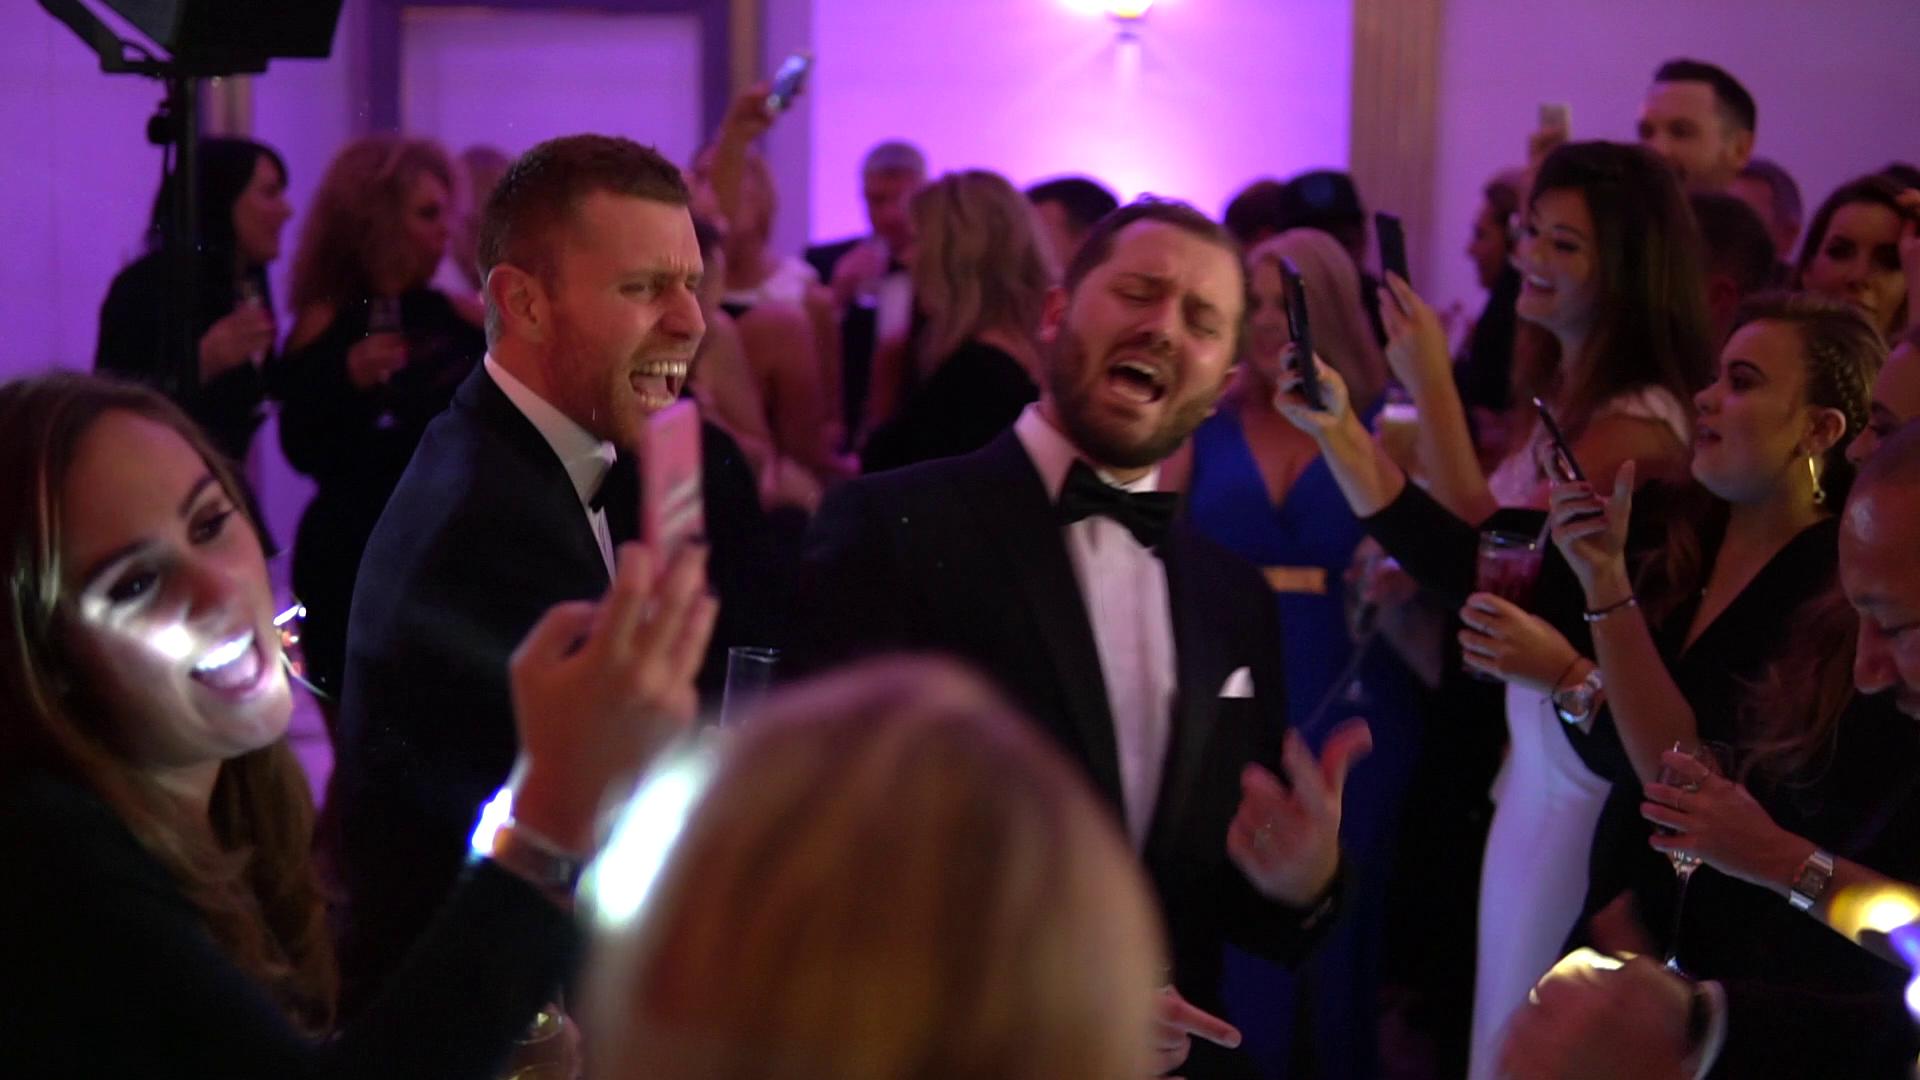 Claridges Wedding Videography